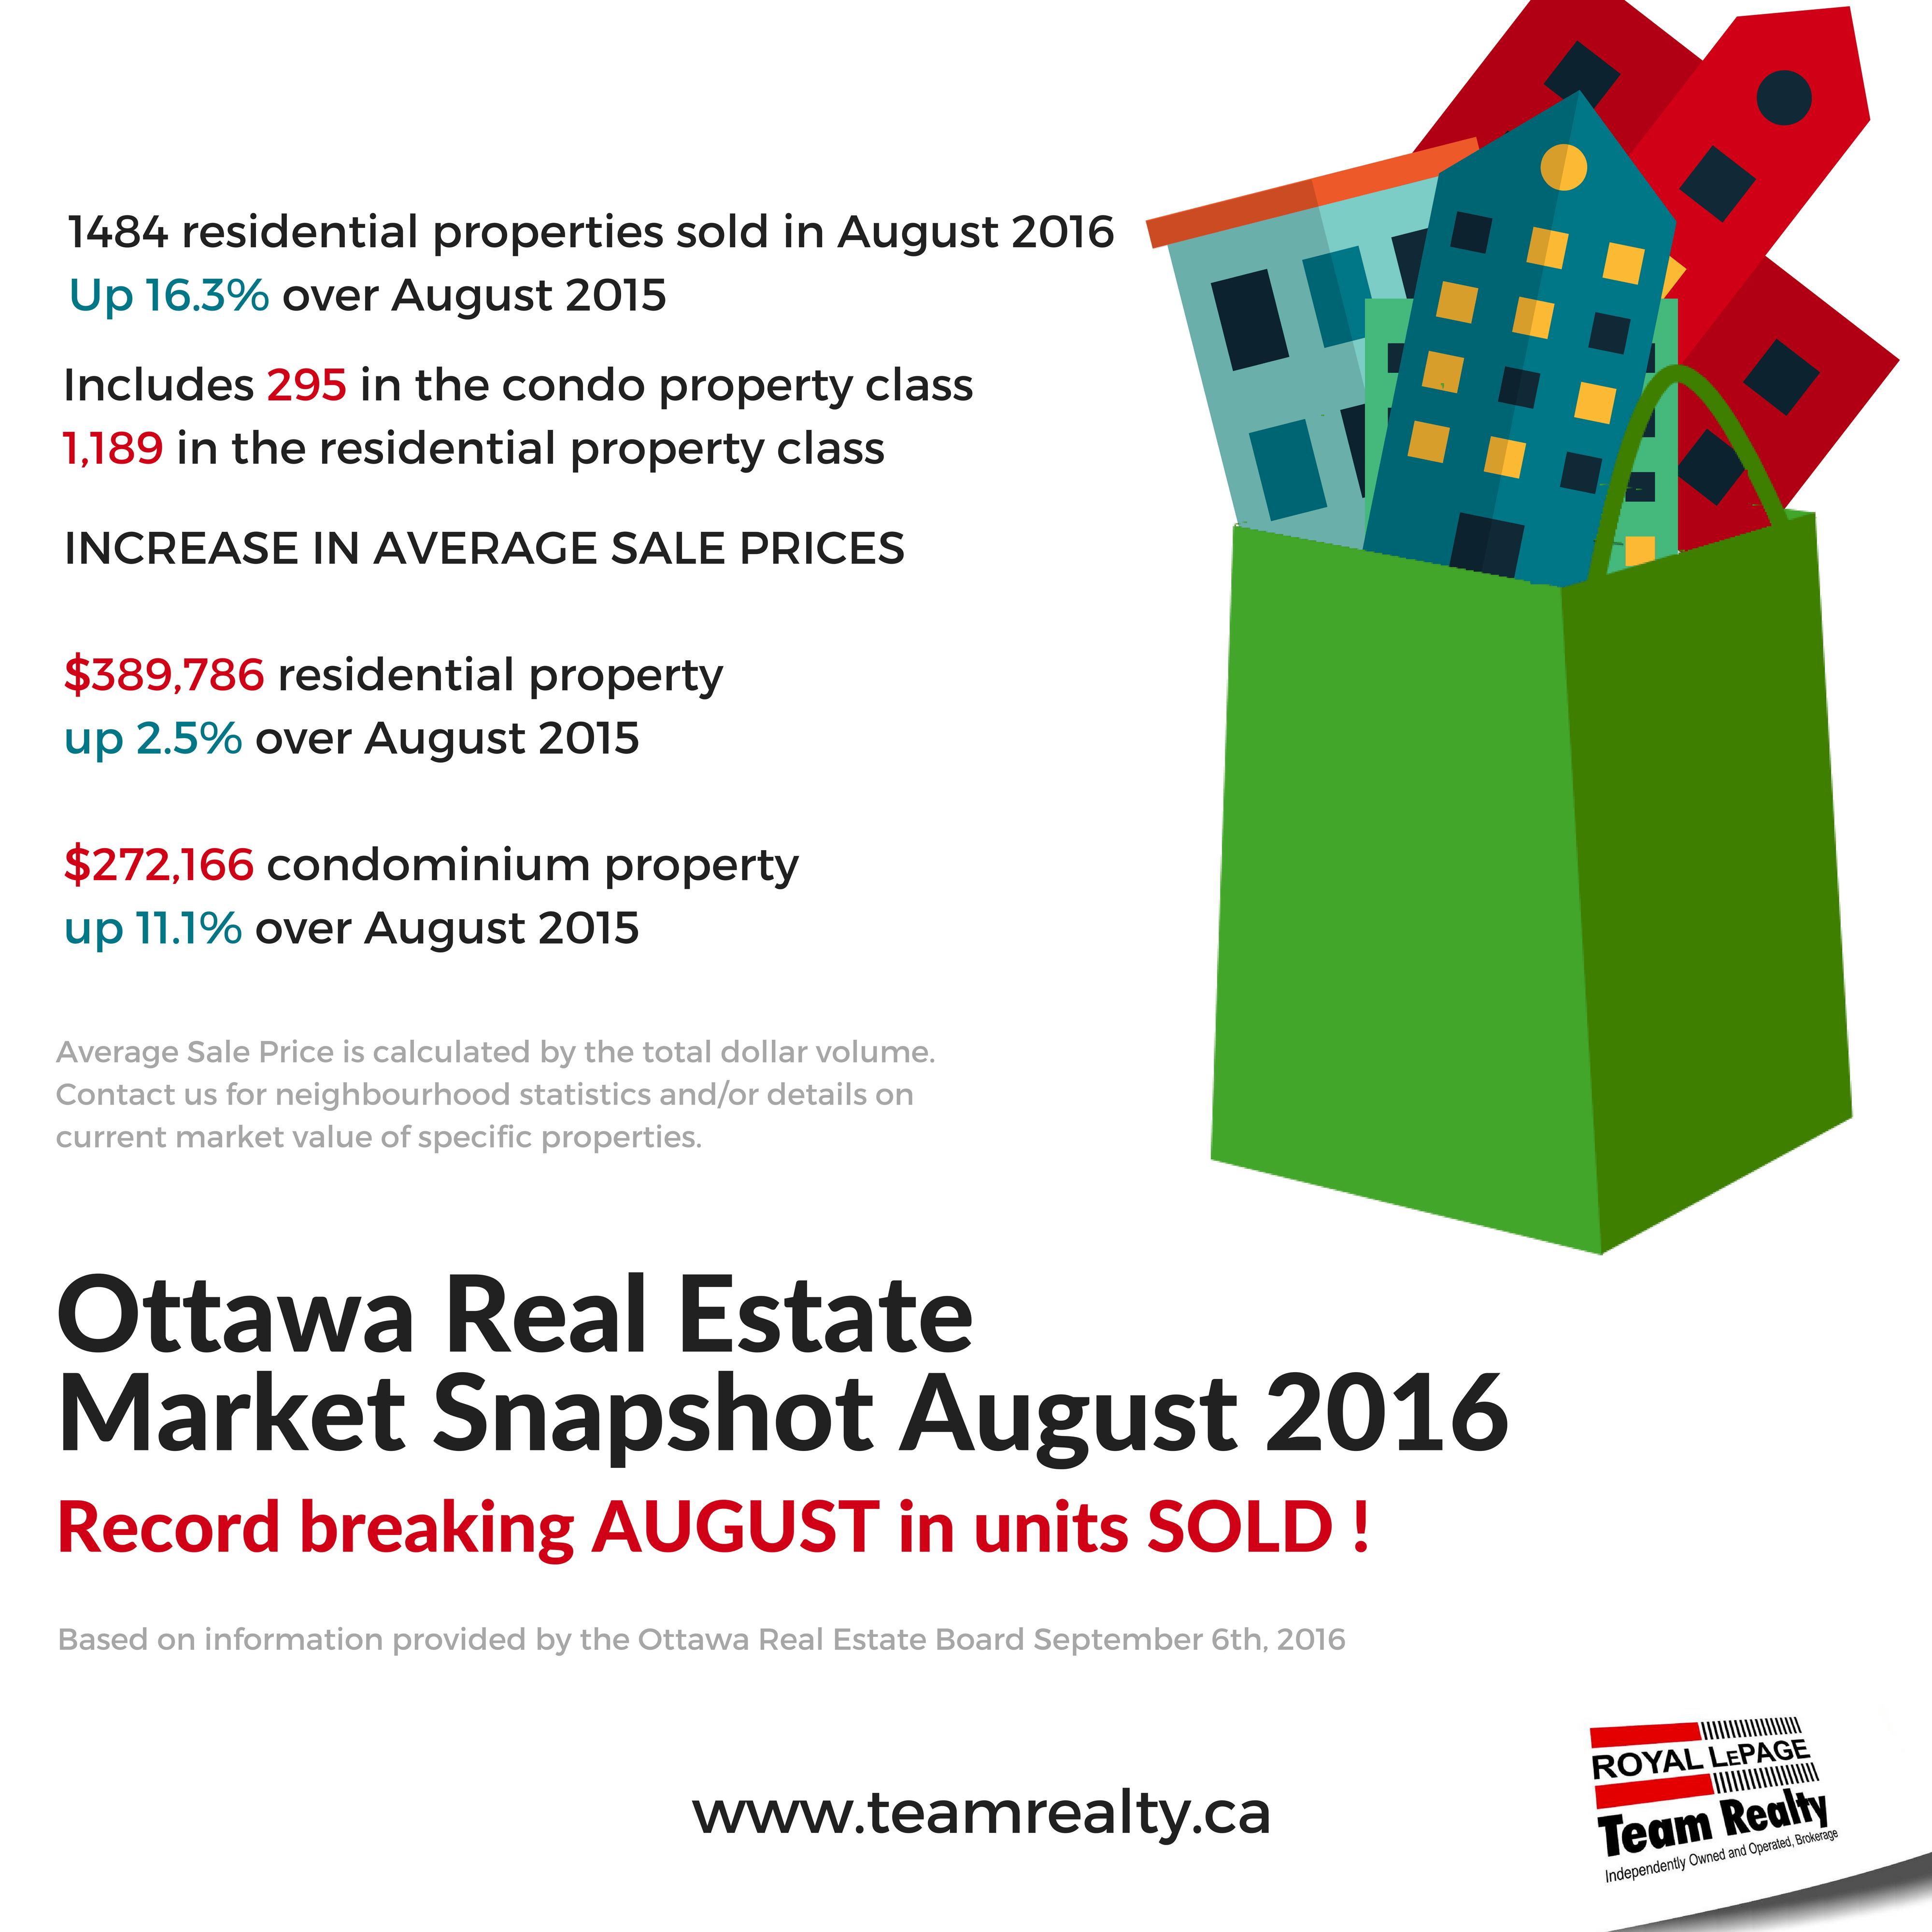 ottawa-real-estatemarket-snapshotaugust-2016-1